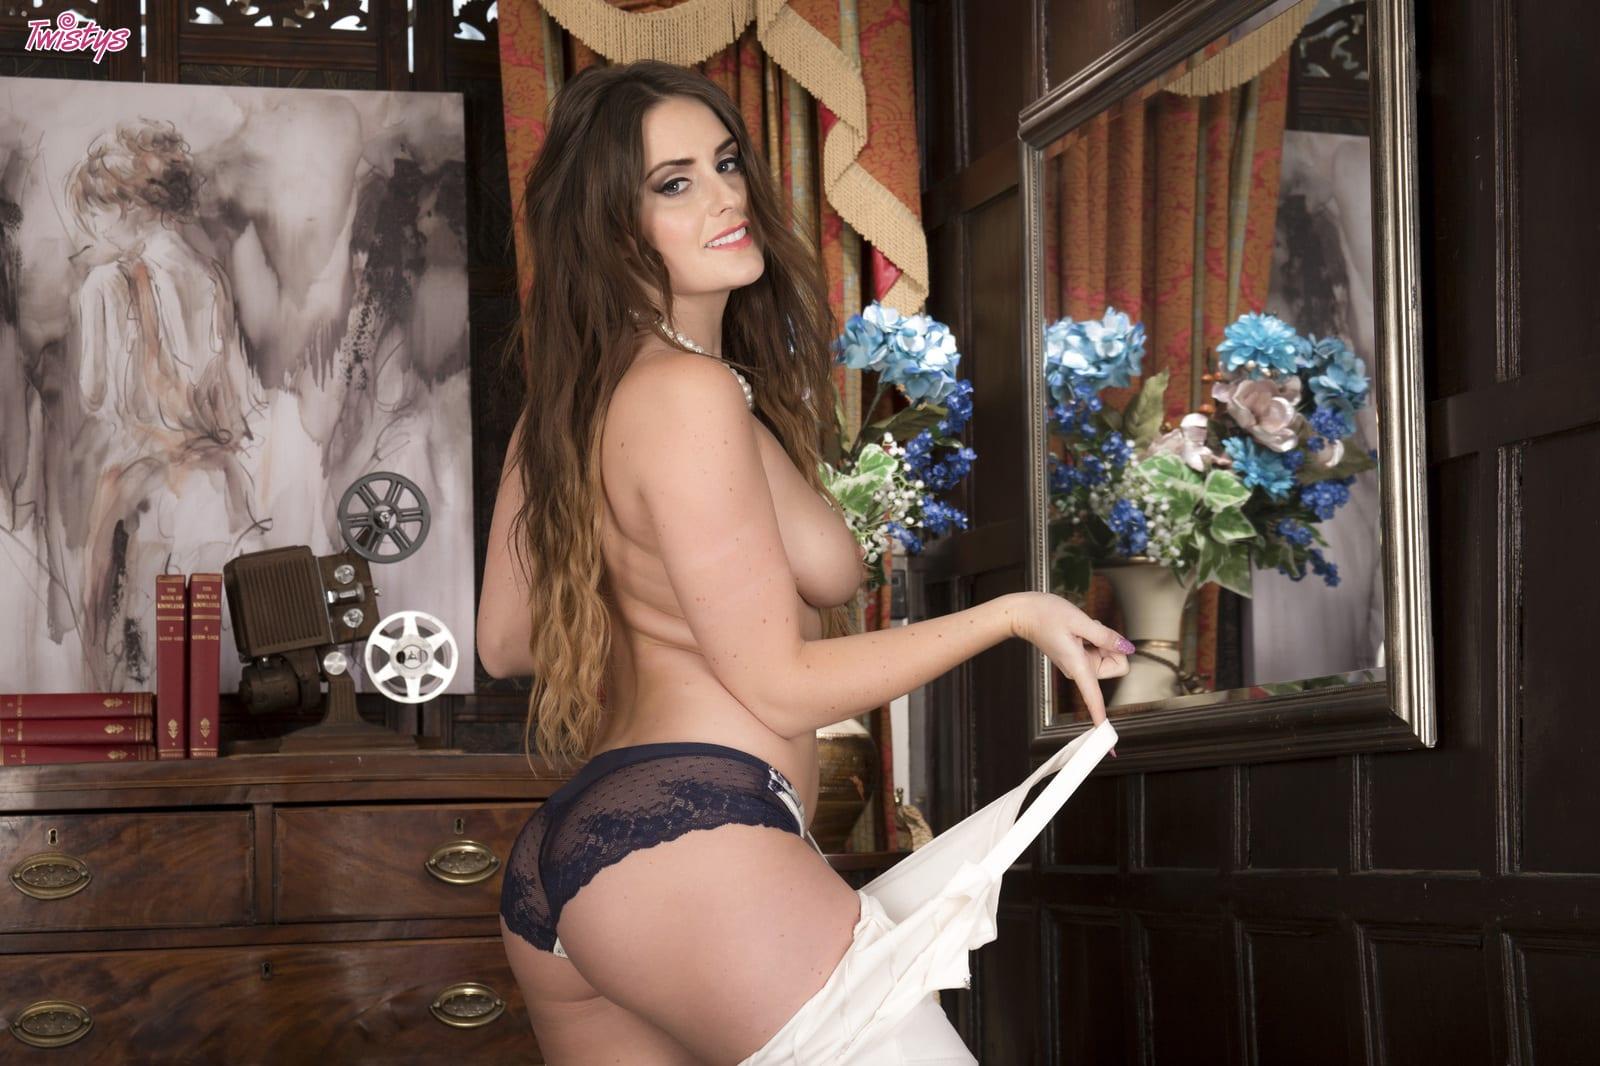 Emma Jayne-green  - Emma G - Swe babepedia @Emma_Green